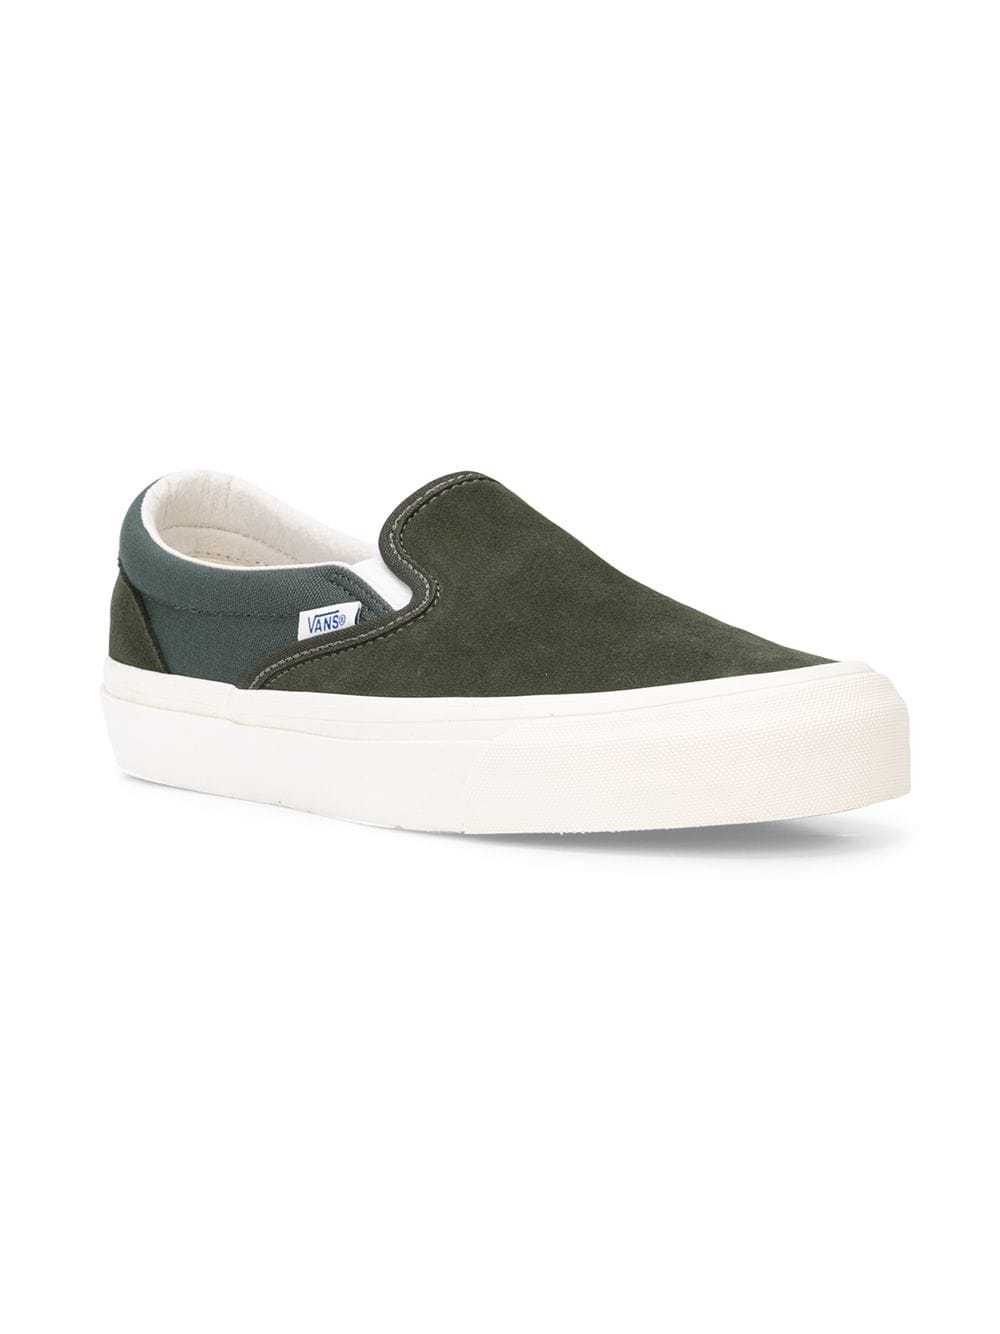 Vans Slip On Pro Sneakers, $91